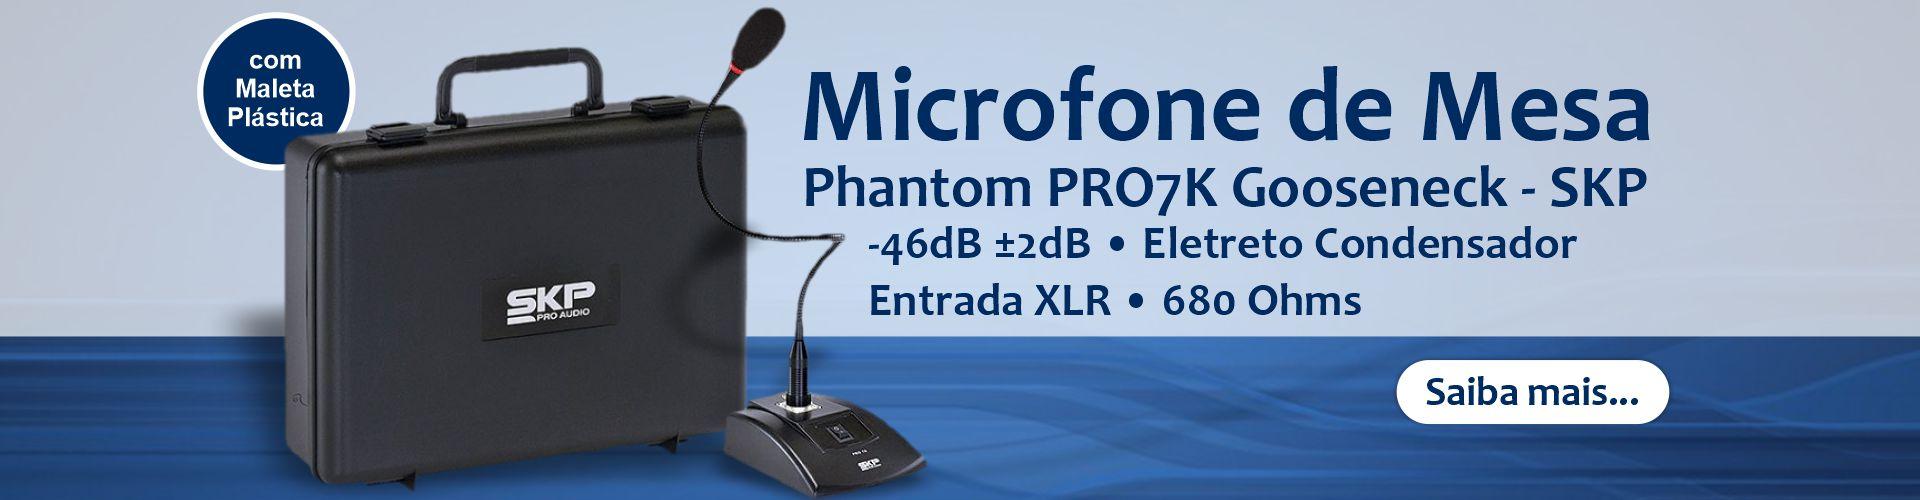 Microfone SKP